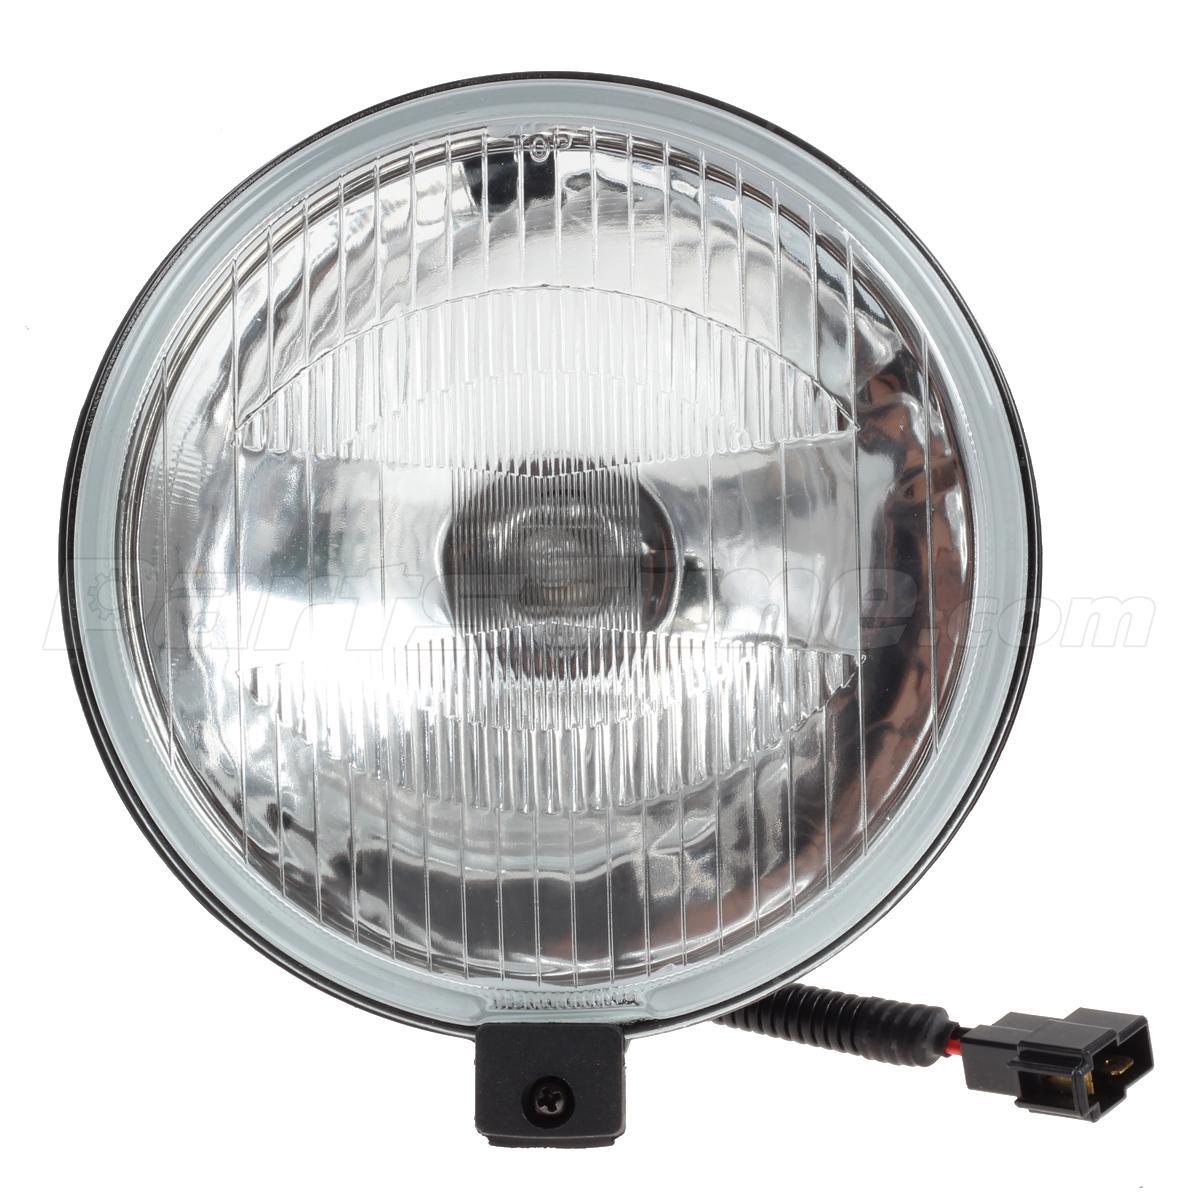 Fj Cruiser Fog Light Switch And Harness Circuit Wiring And Diagram Land  Cruiser Wiring Diagram Fj Cruiser Auxiliary Lights Wiring Diagram